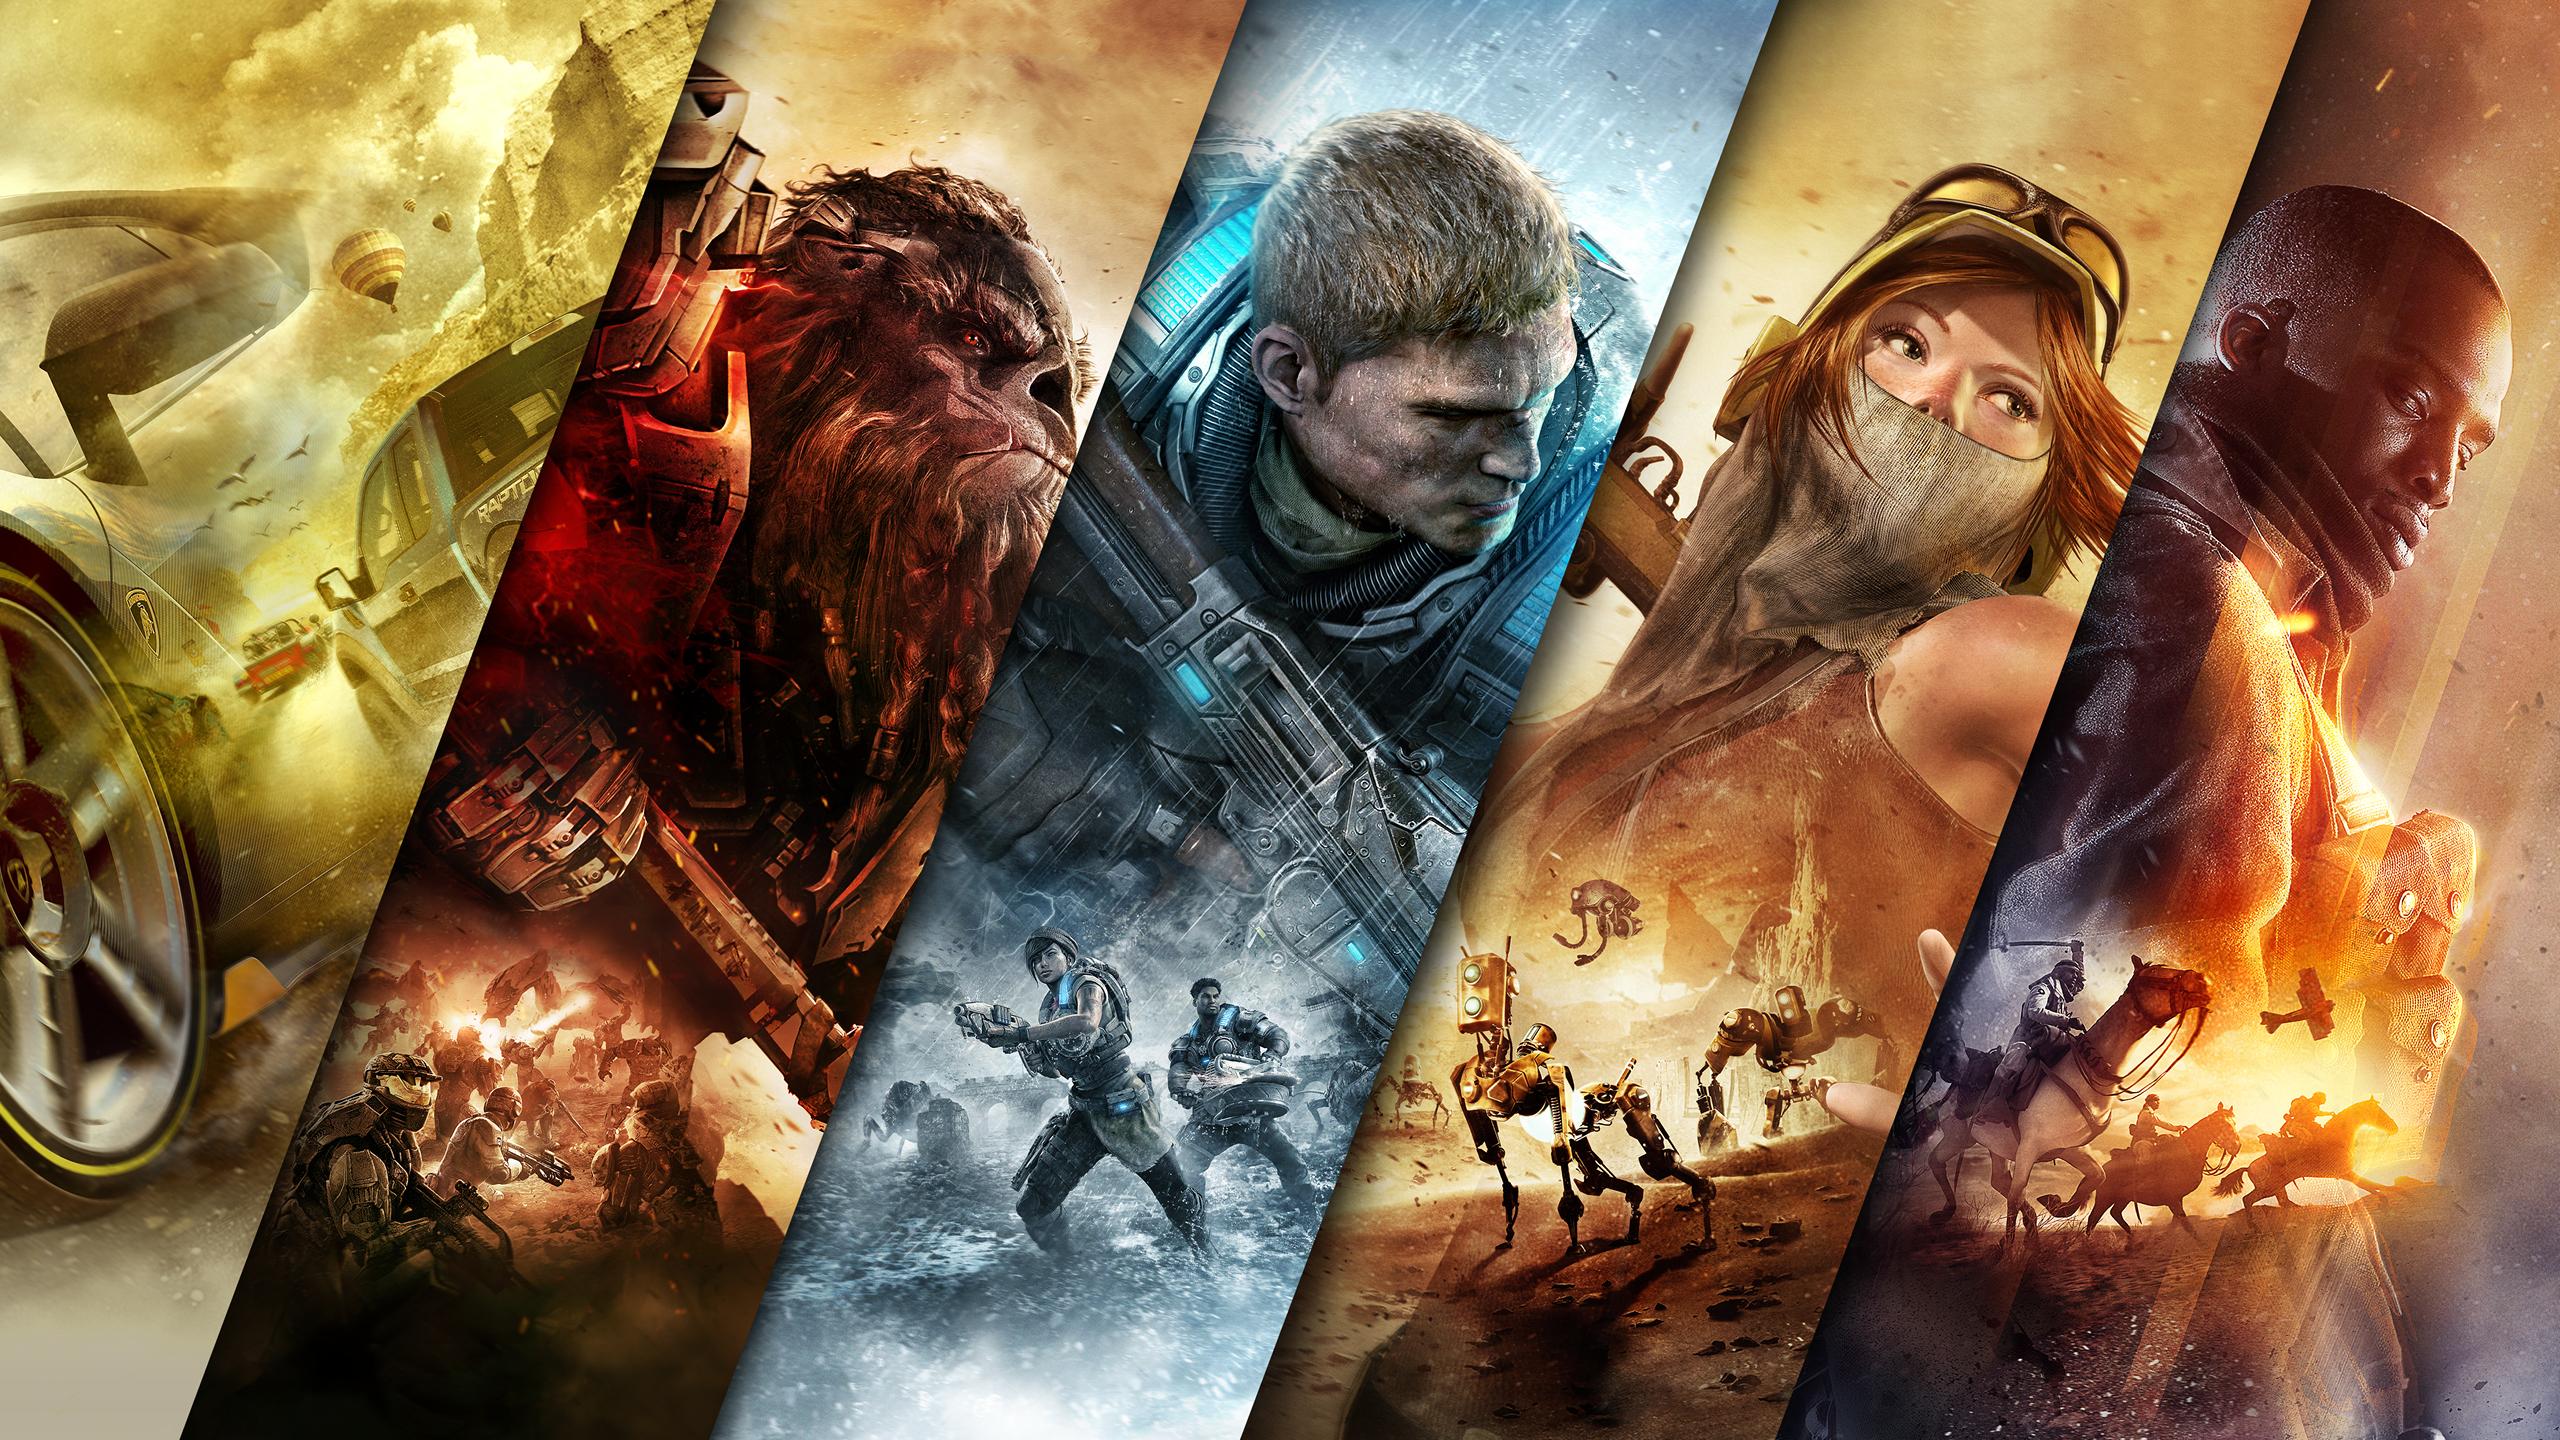 Battlefield 1 Forza Horizon 3 Gears Of War 4 Halo Wars 2 Recore 2560x1440